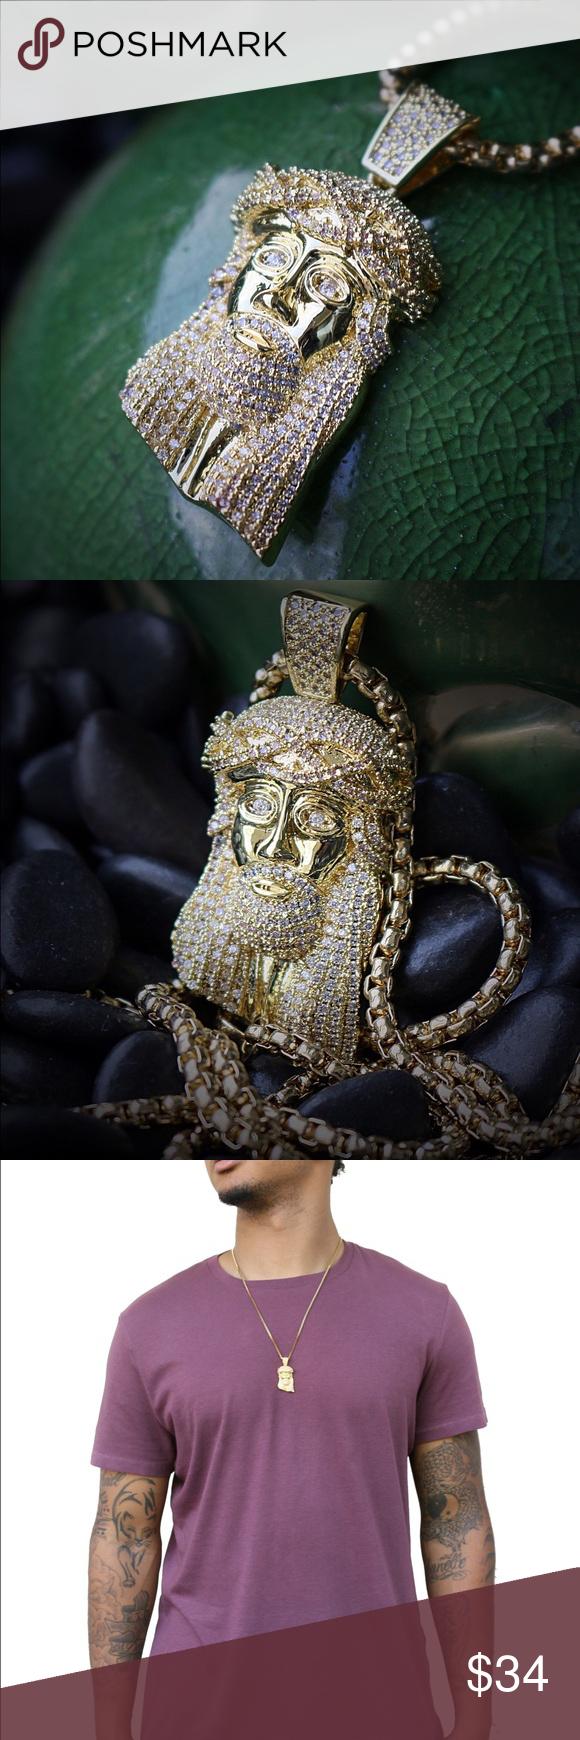 14k gold plated mini jesus piece necklace 14k gold plated mini jesus 14k gold plated mini jesus piece necklace 14k gold plated mini jesus piece with 26 inch aloadofball Choice Image